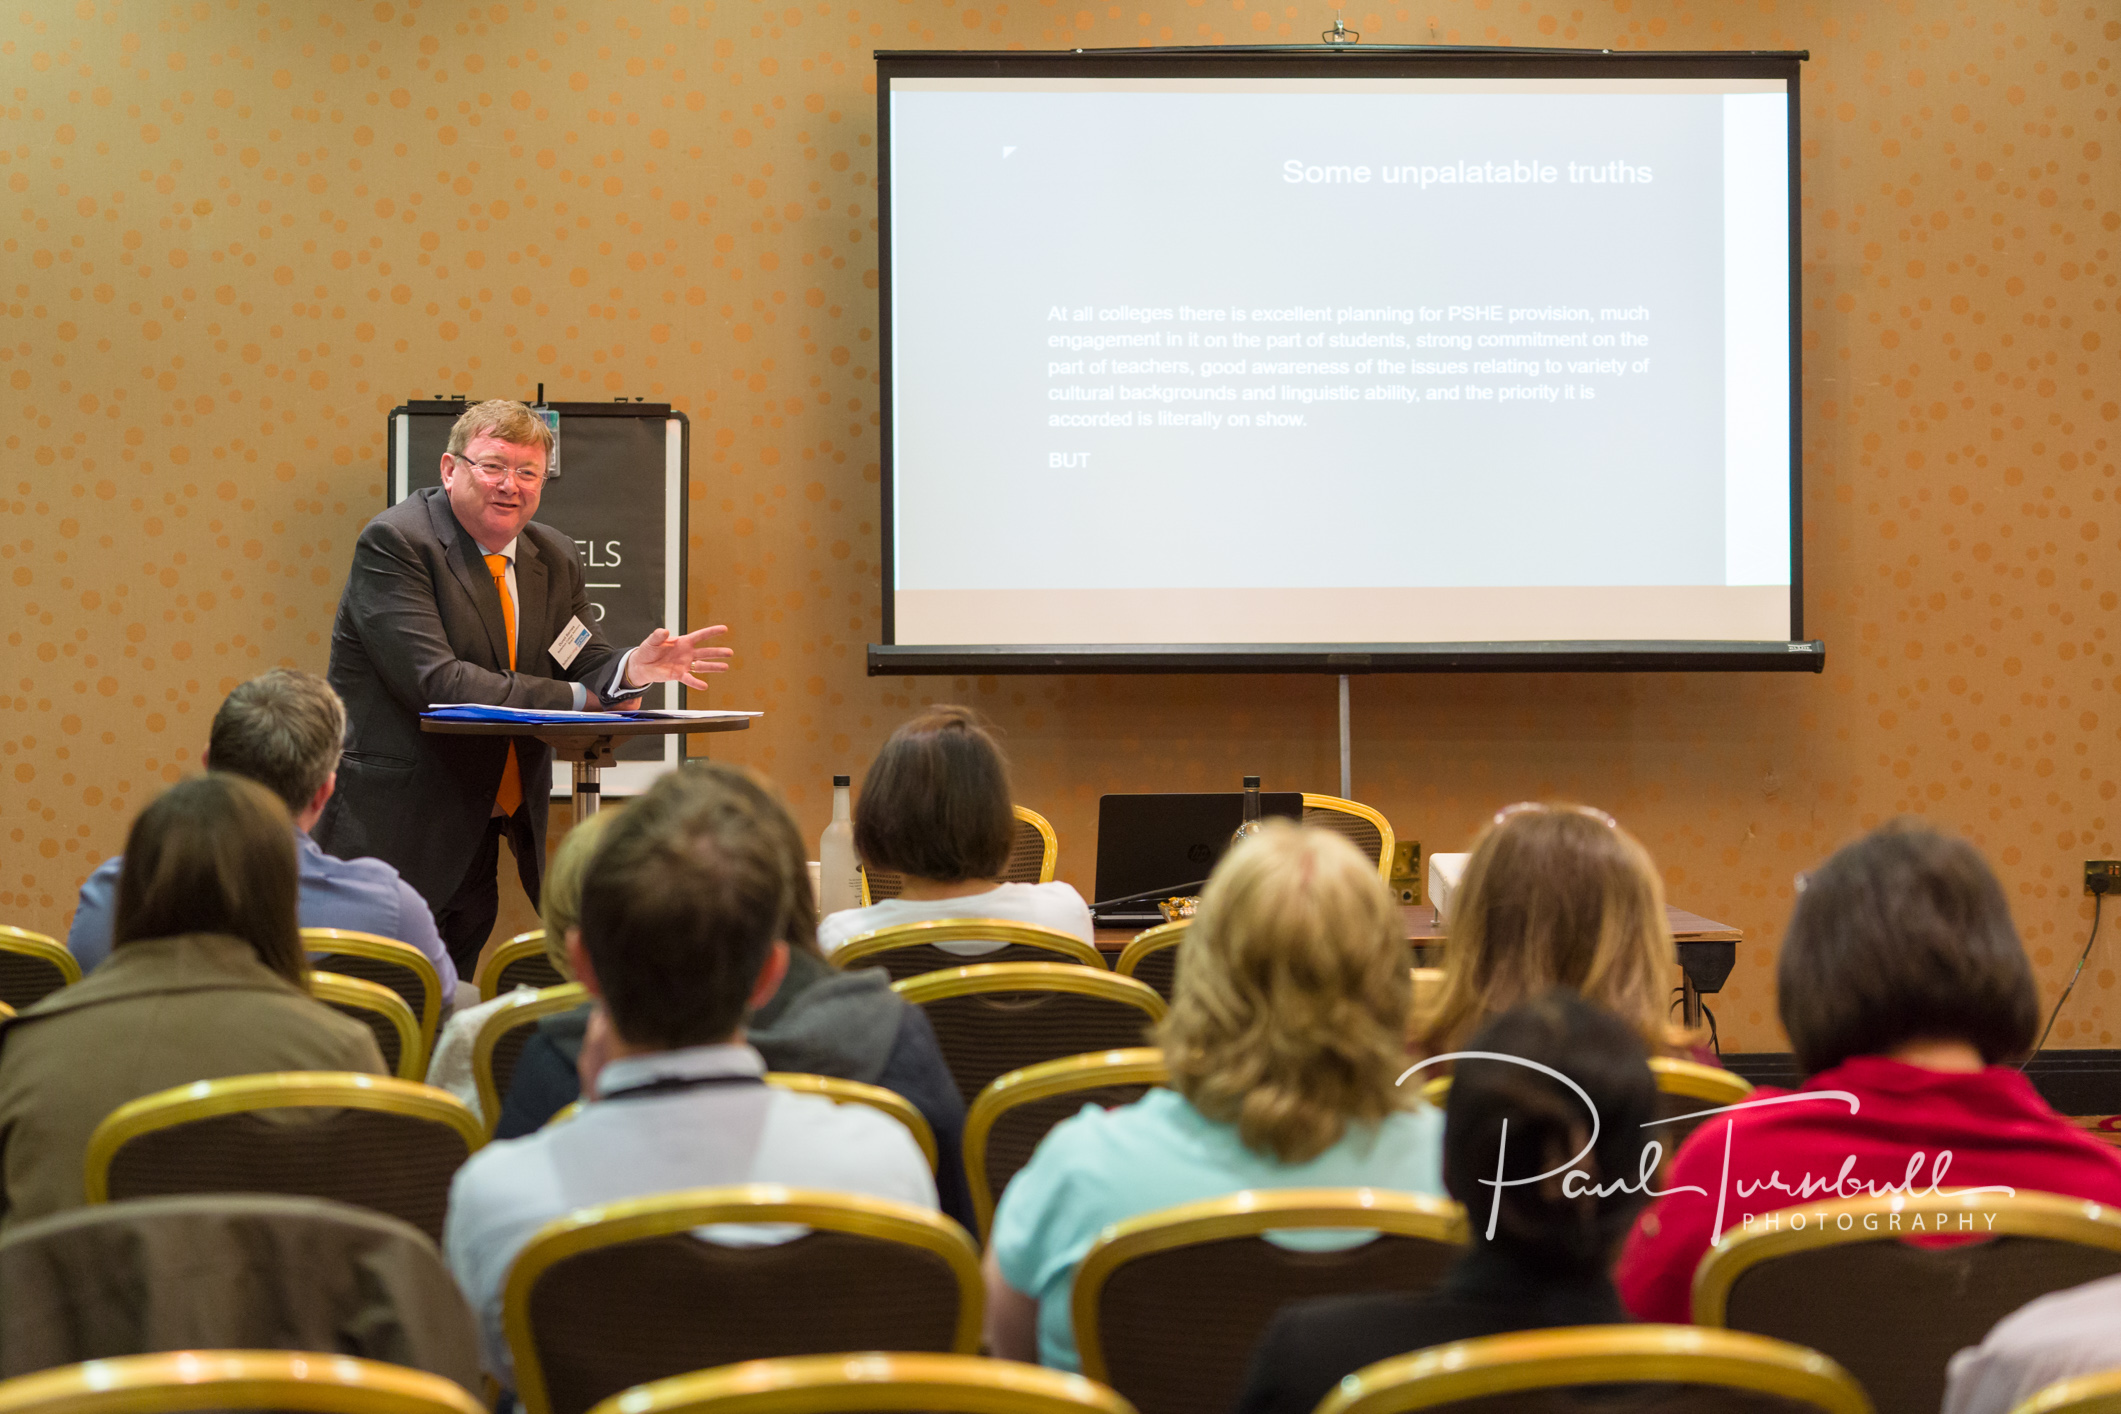 conference-event-photographer-queens-hotel-leeds-yorkshire-049.jpg